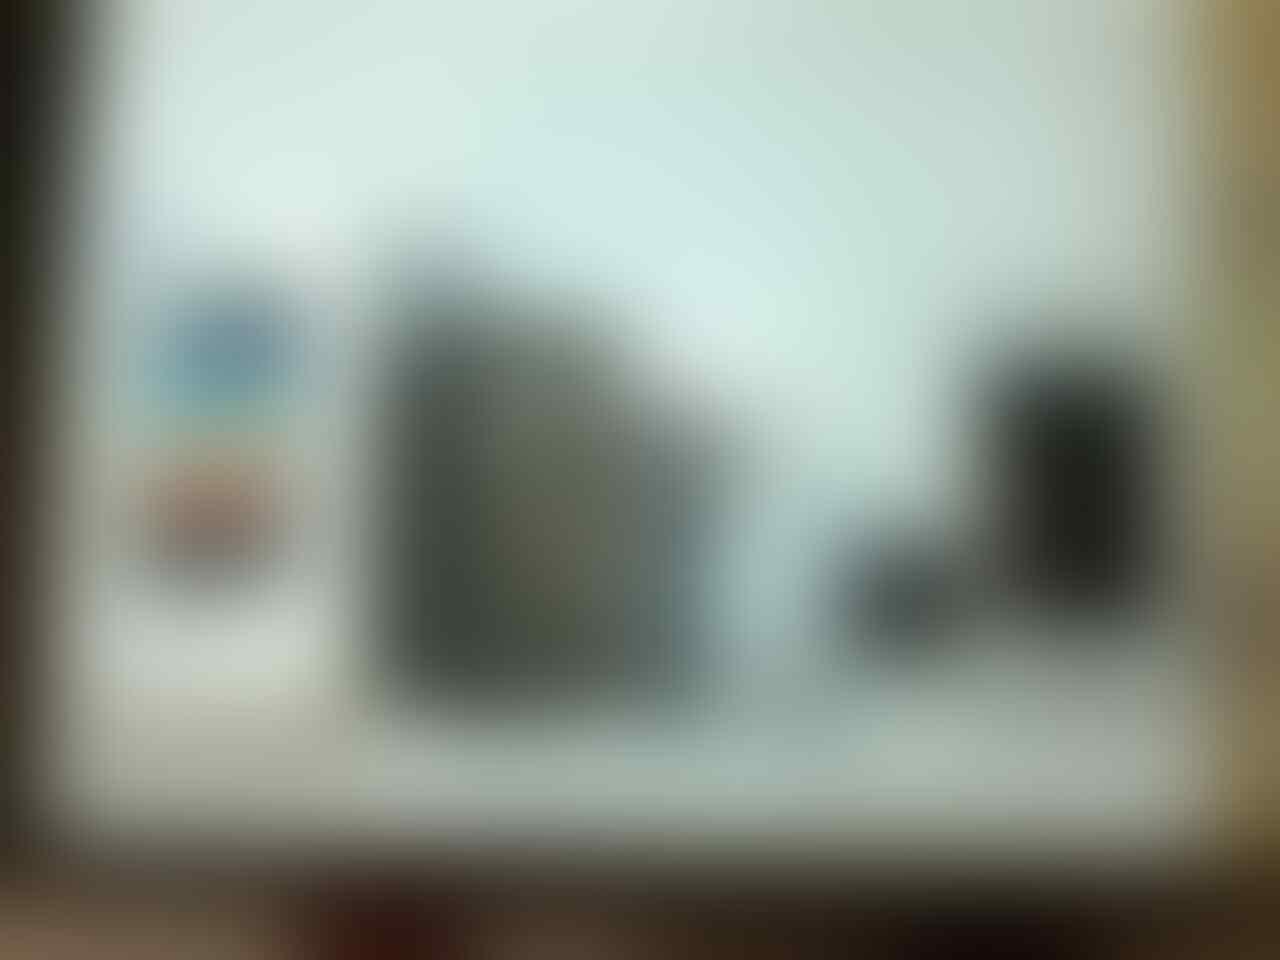 GALAXY ACE PLUS GT-S7500 WHITE LIKE A NEW JOGJA SOLO